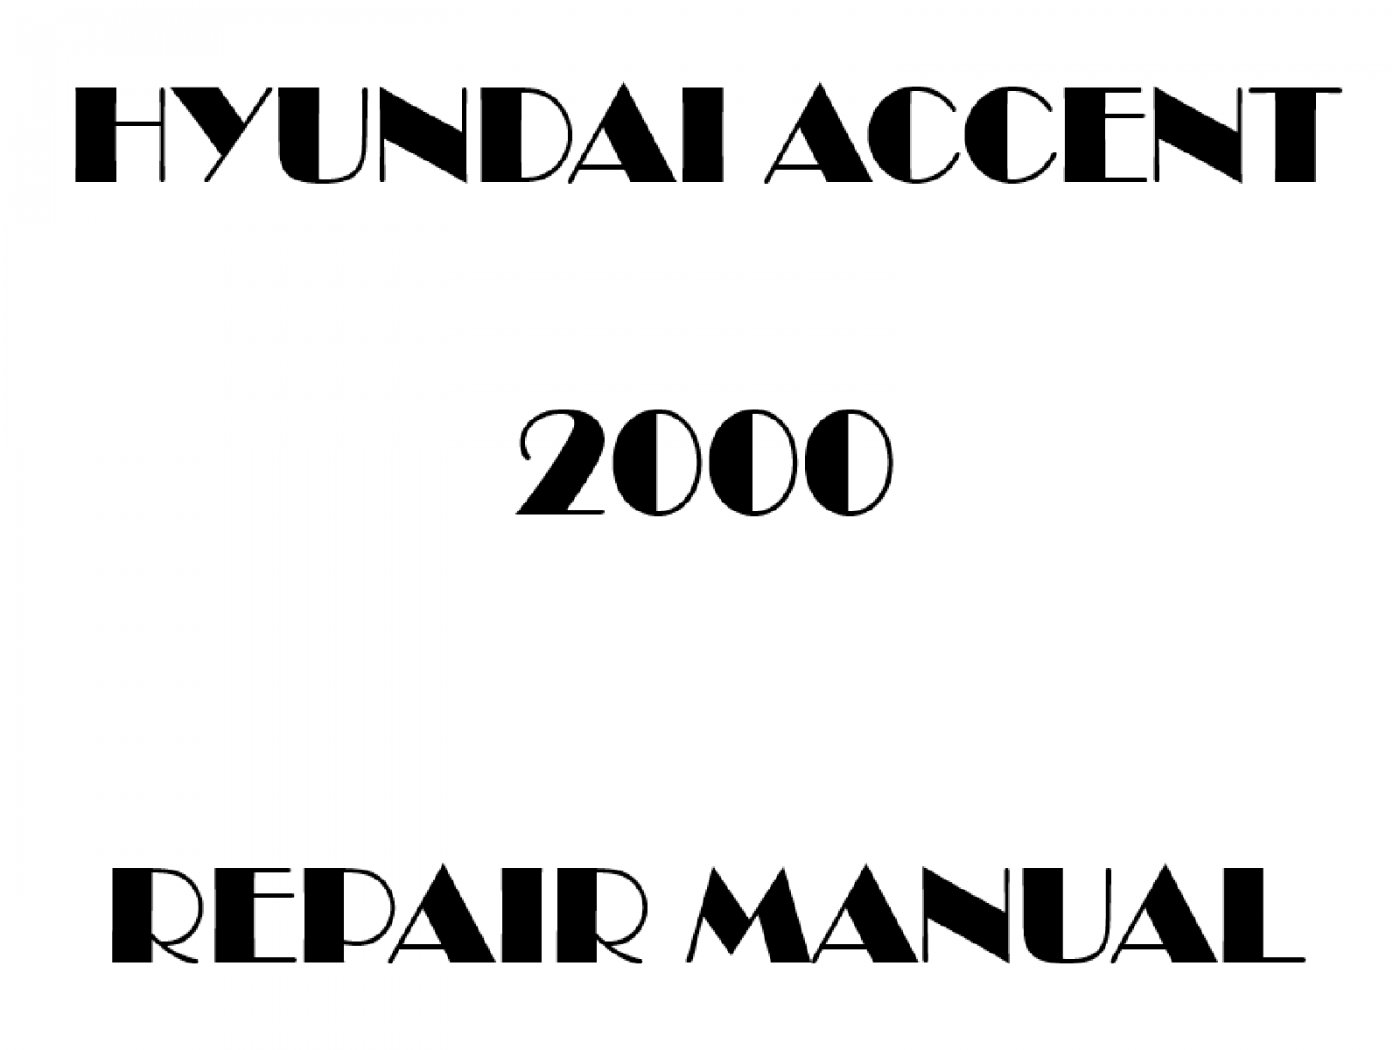 2000 Hyundai Accent repair manual